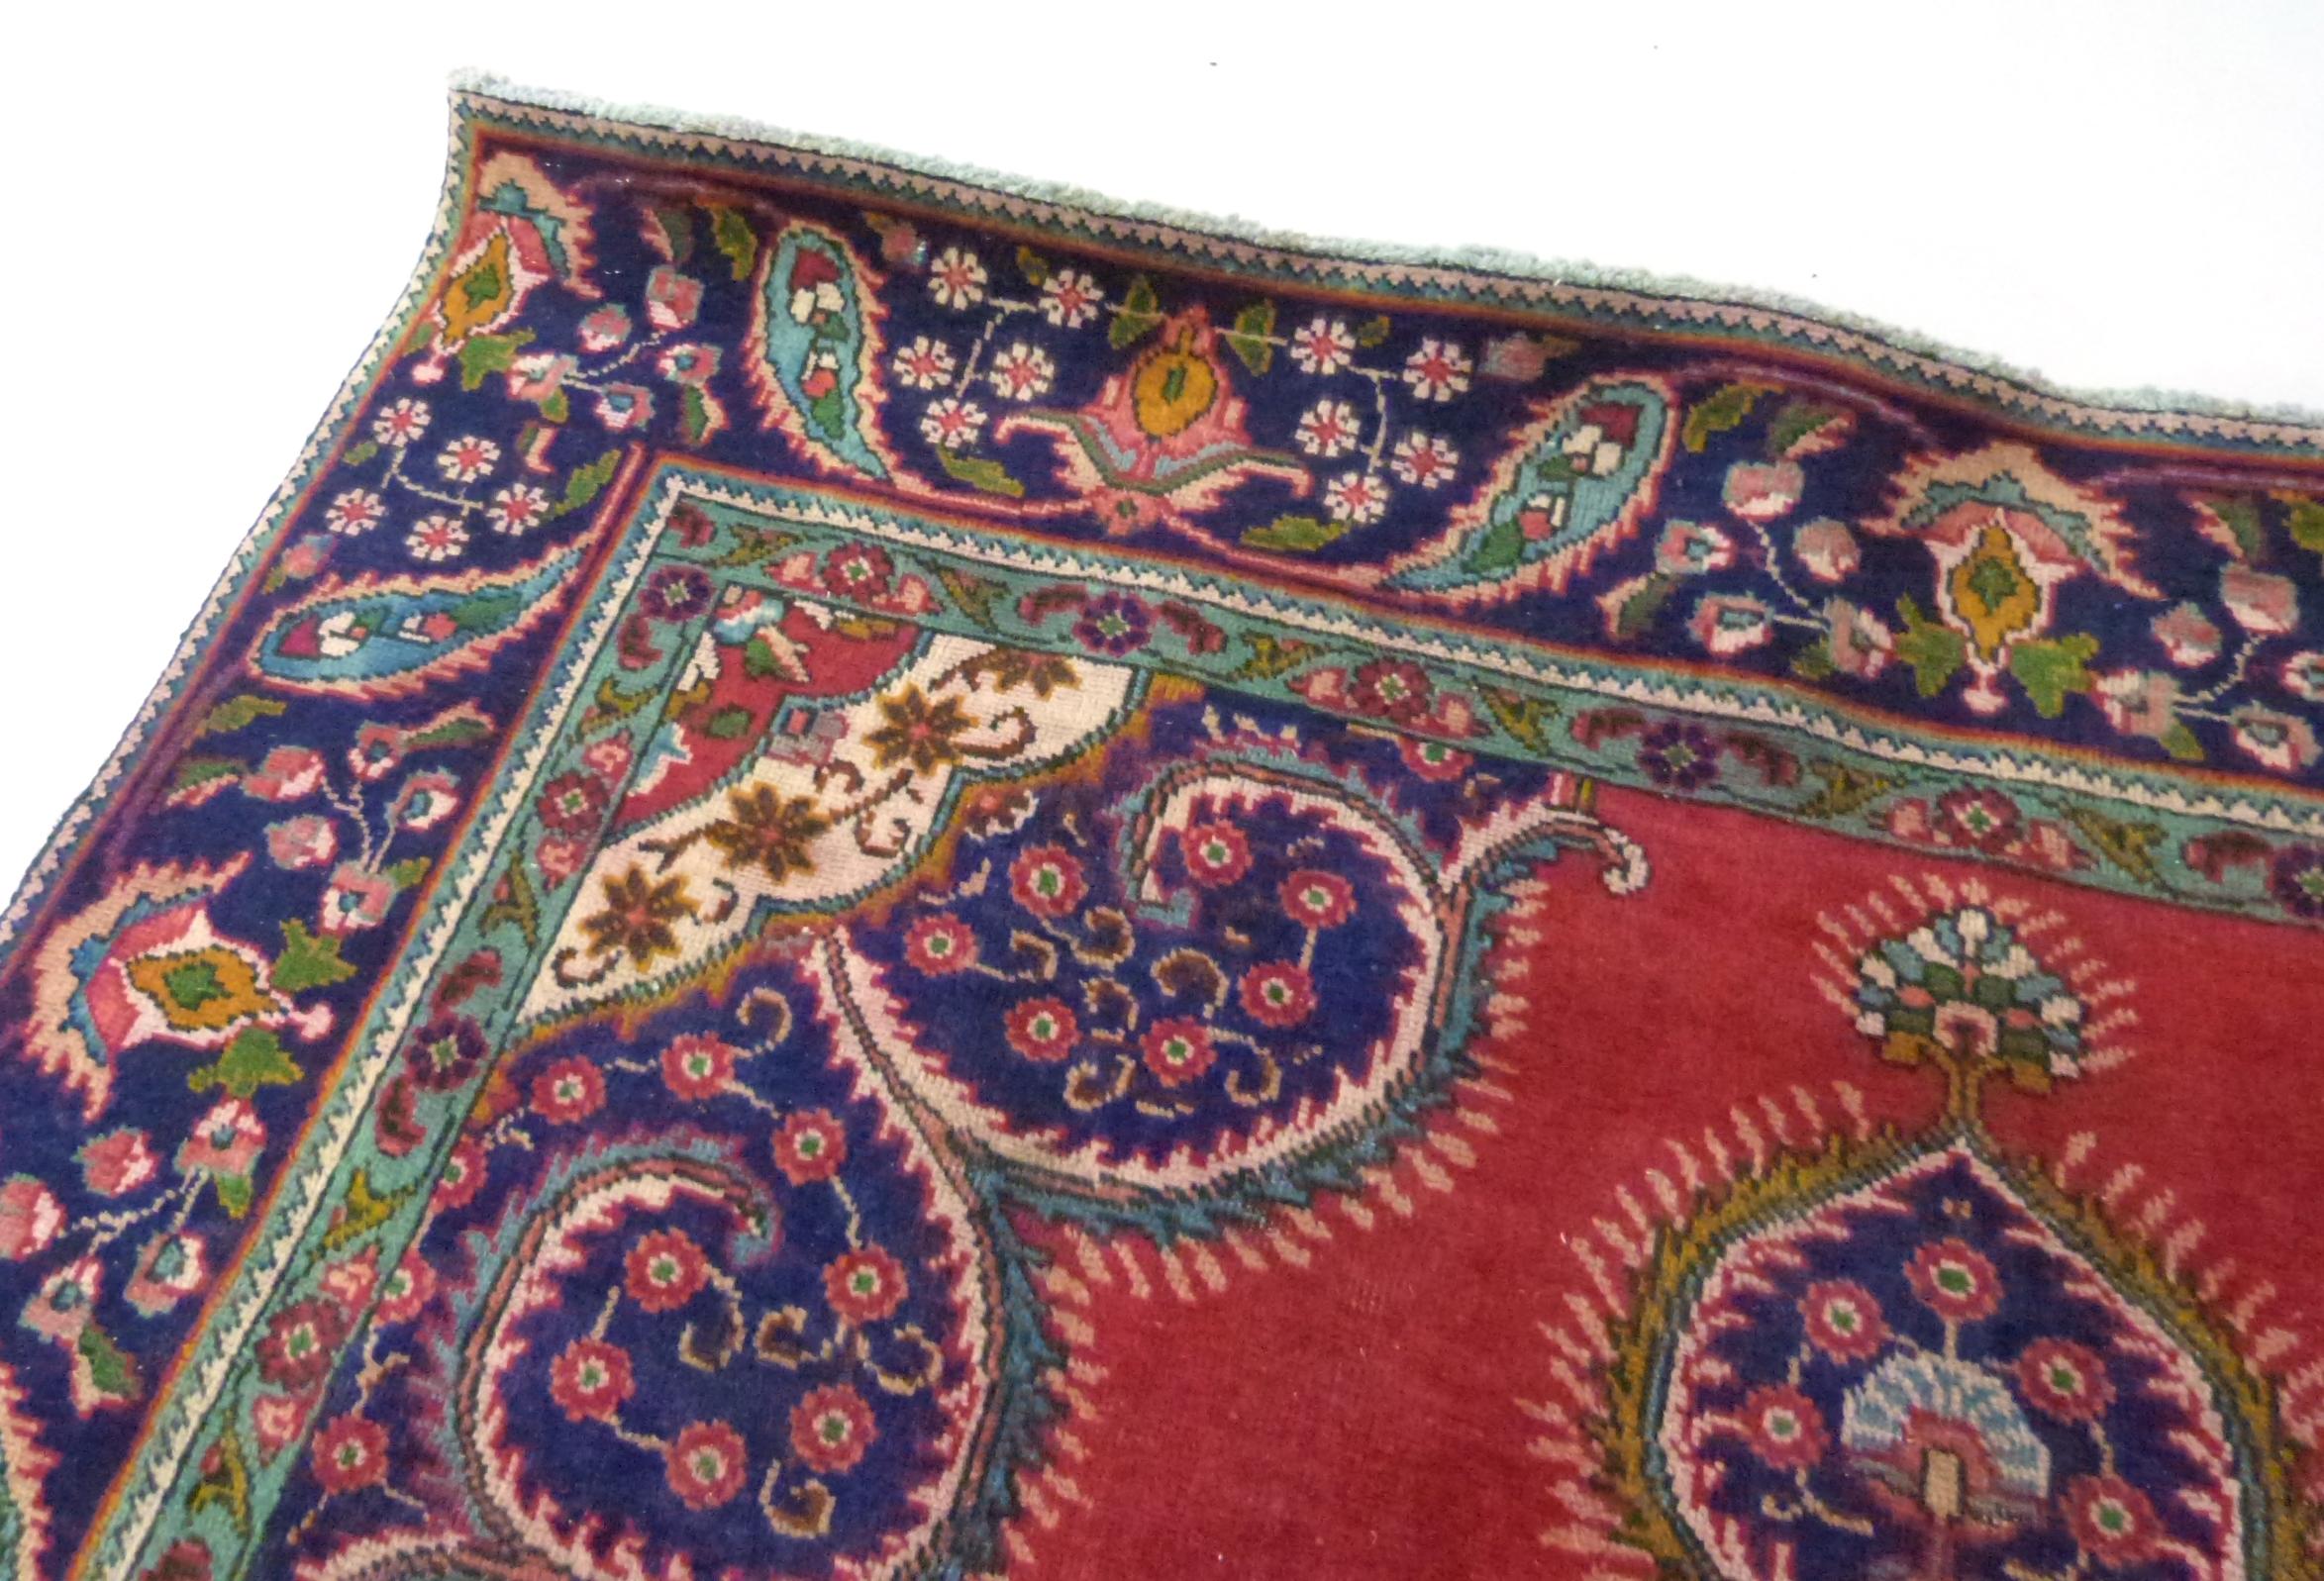 Deep ground thick pile Persian Narouan Carpet,decorated with various motifs & symbols 276cm x - Image 6 of 9